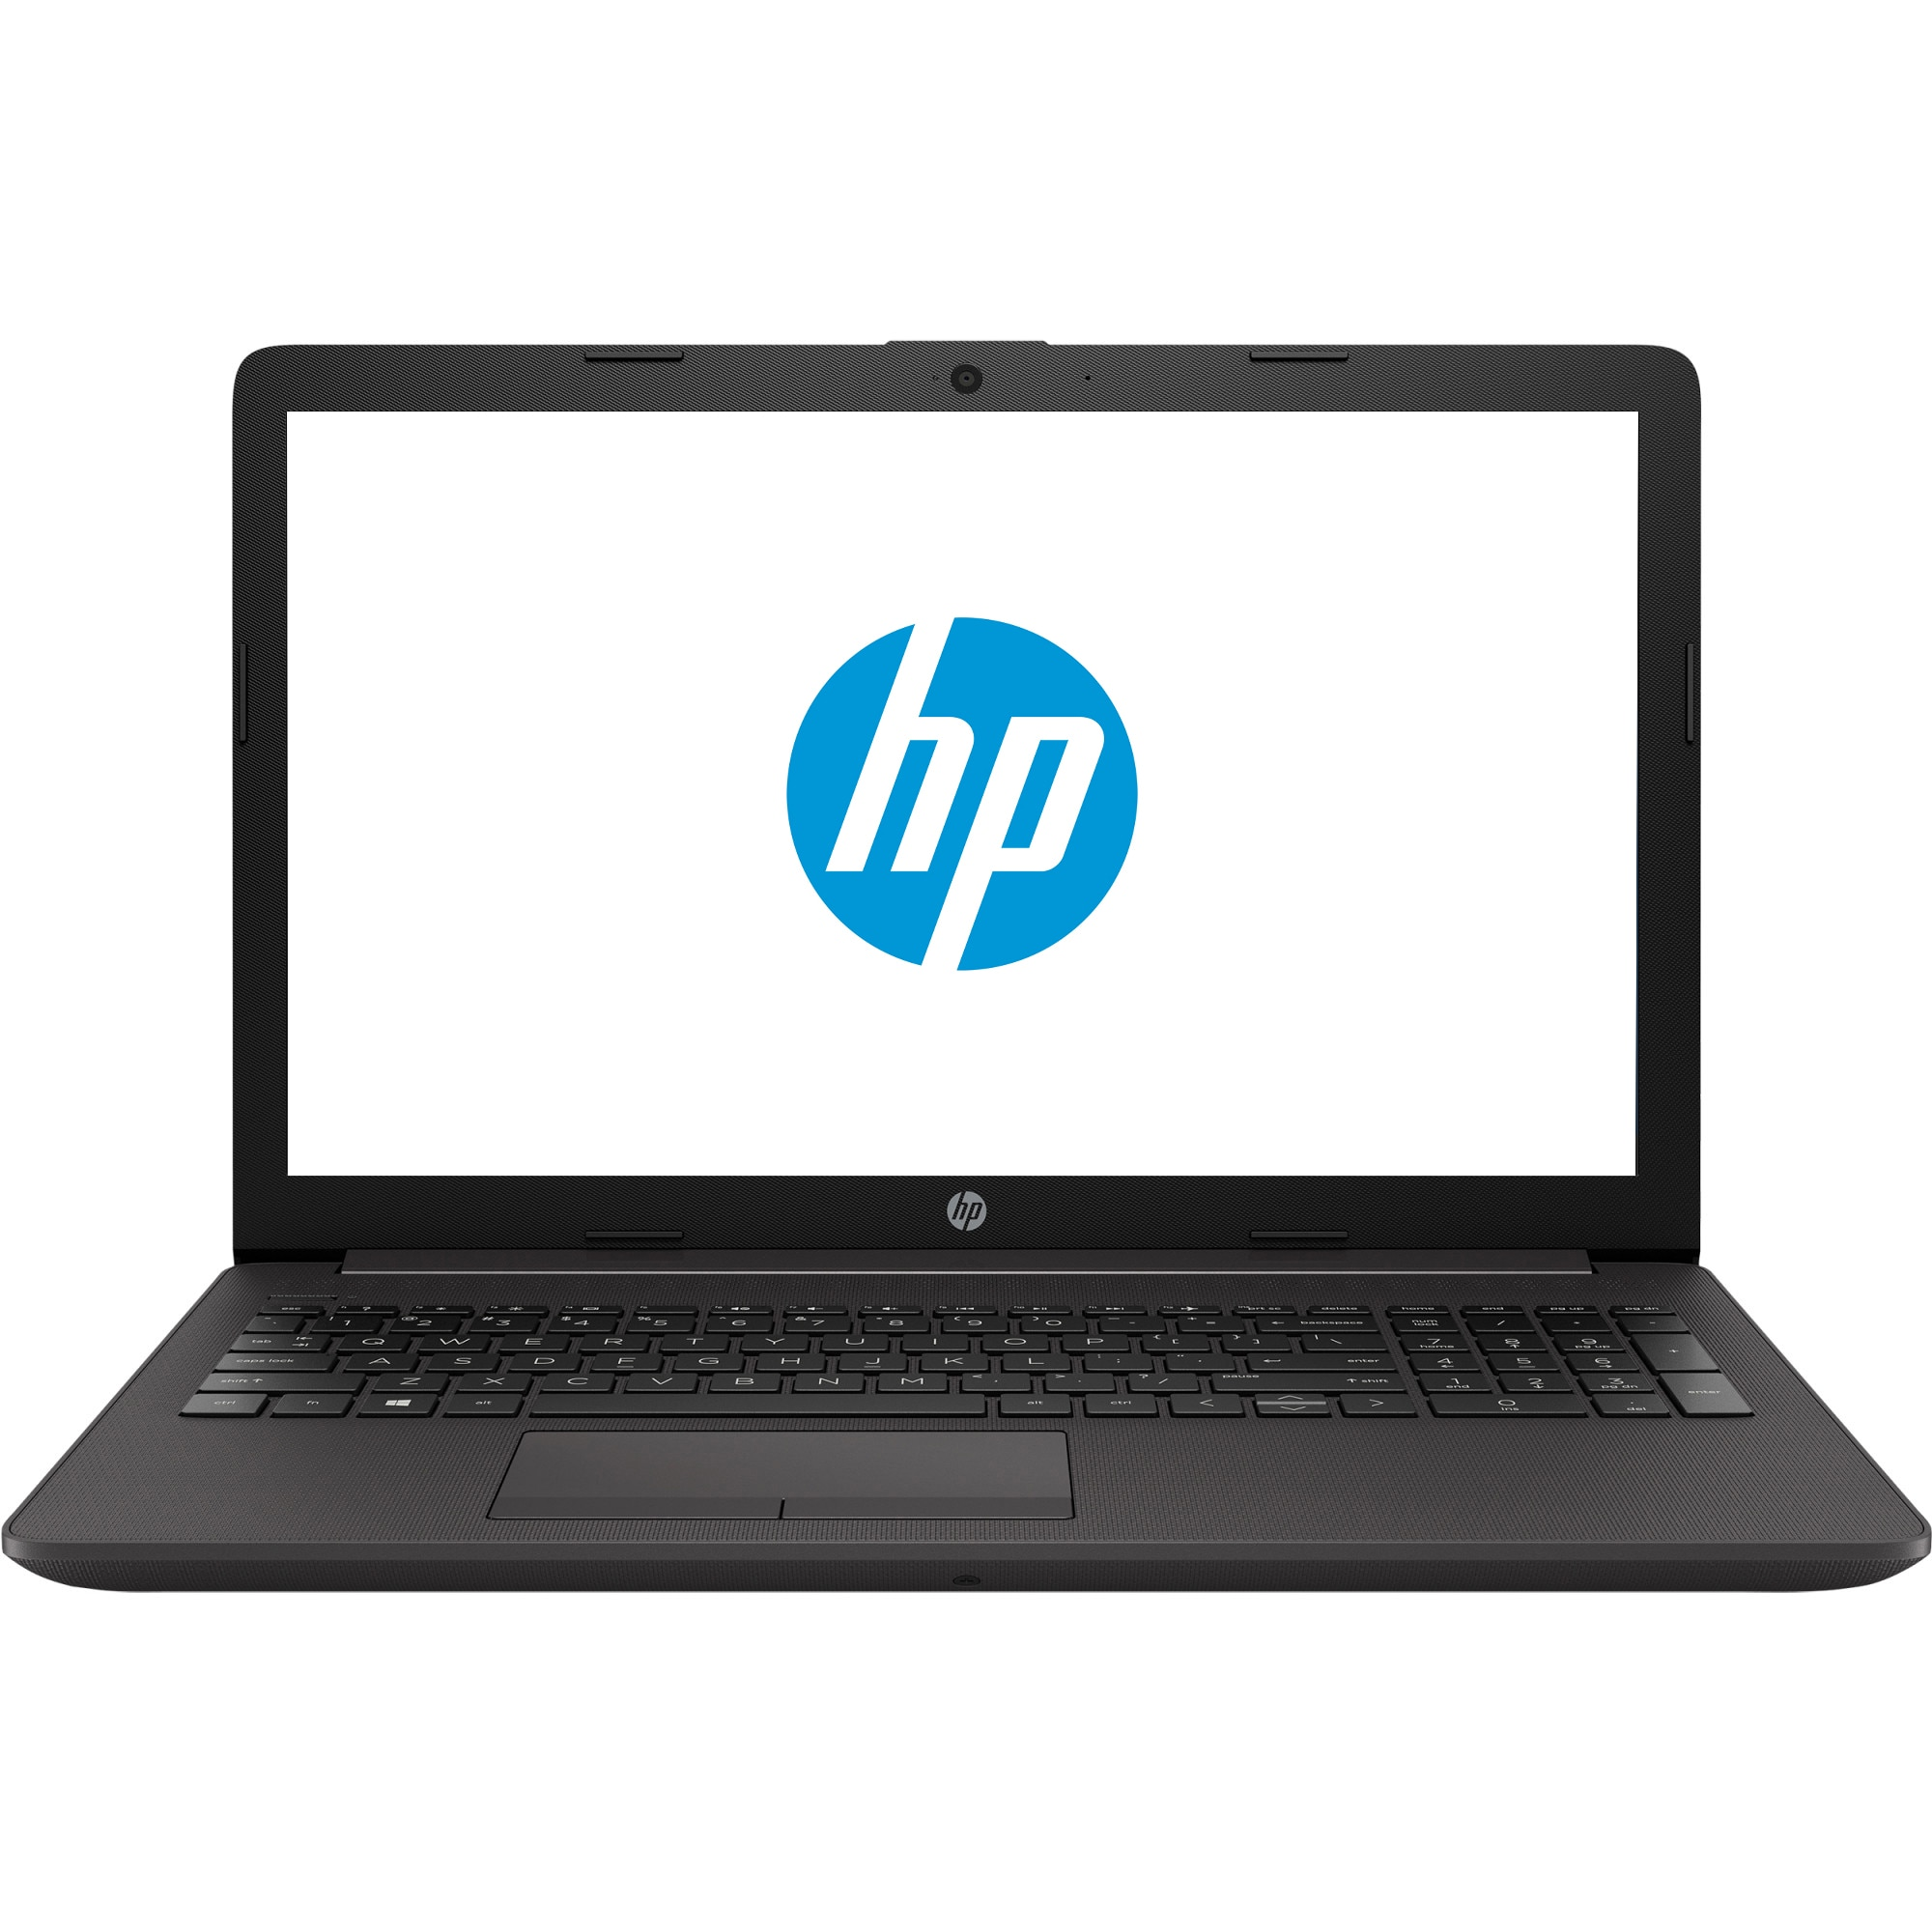 "Fotografie Laptop HP 255 G7 cu procesor AMD Ryzen™ 5 3500U pana la 3.70 GHz, 15.6"", Full HD, 8GB, 256GB SSD, AMD Radeon™ Vega 8, Free DOS. Black"